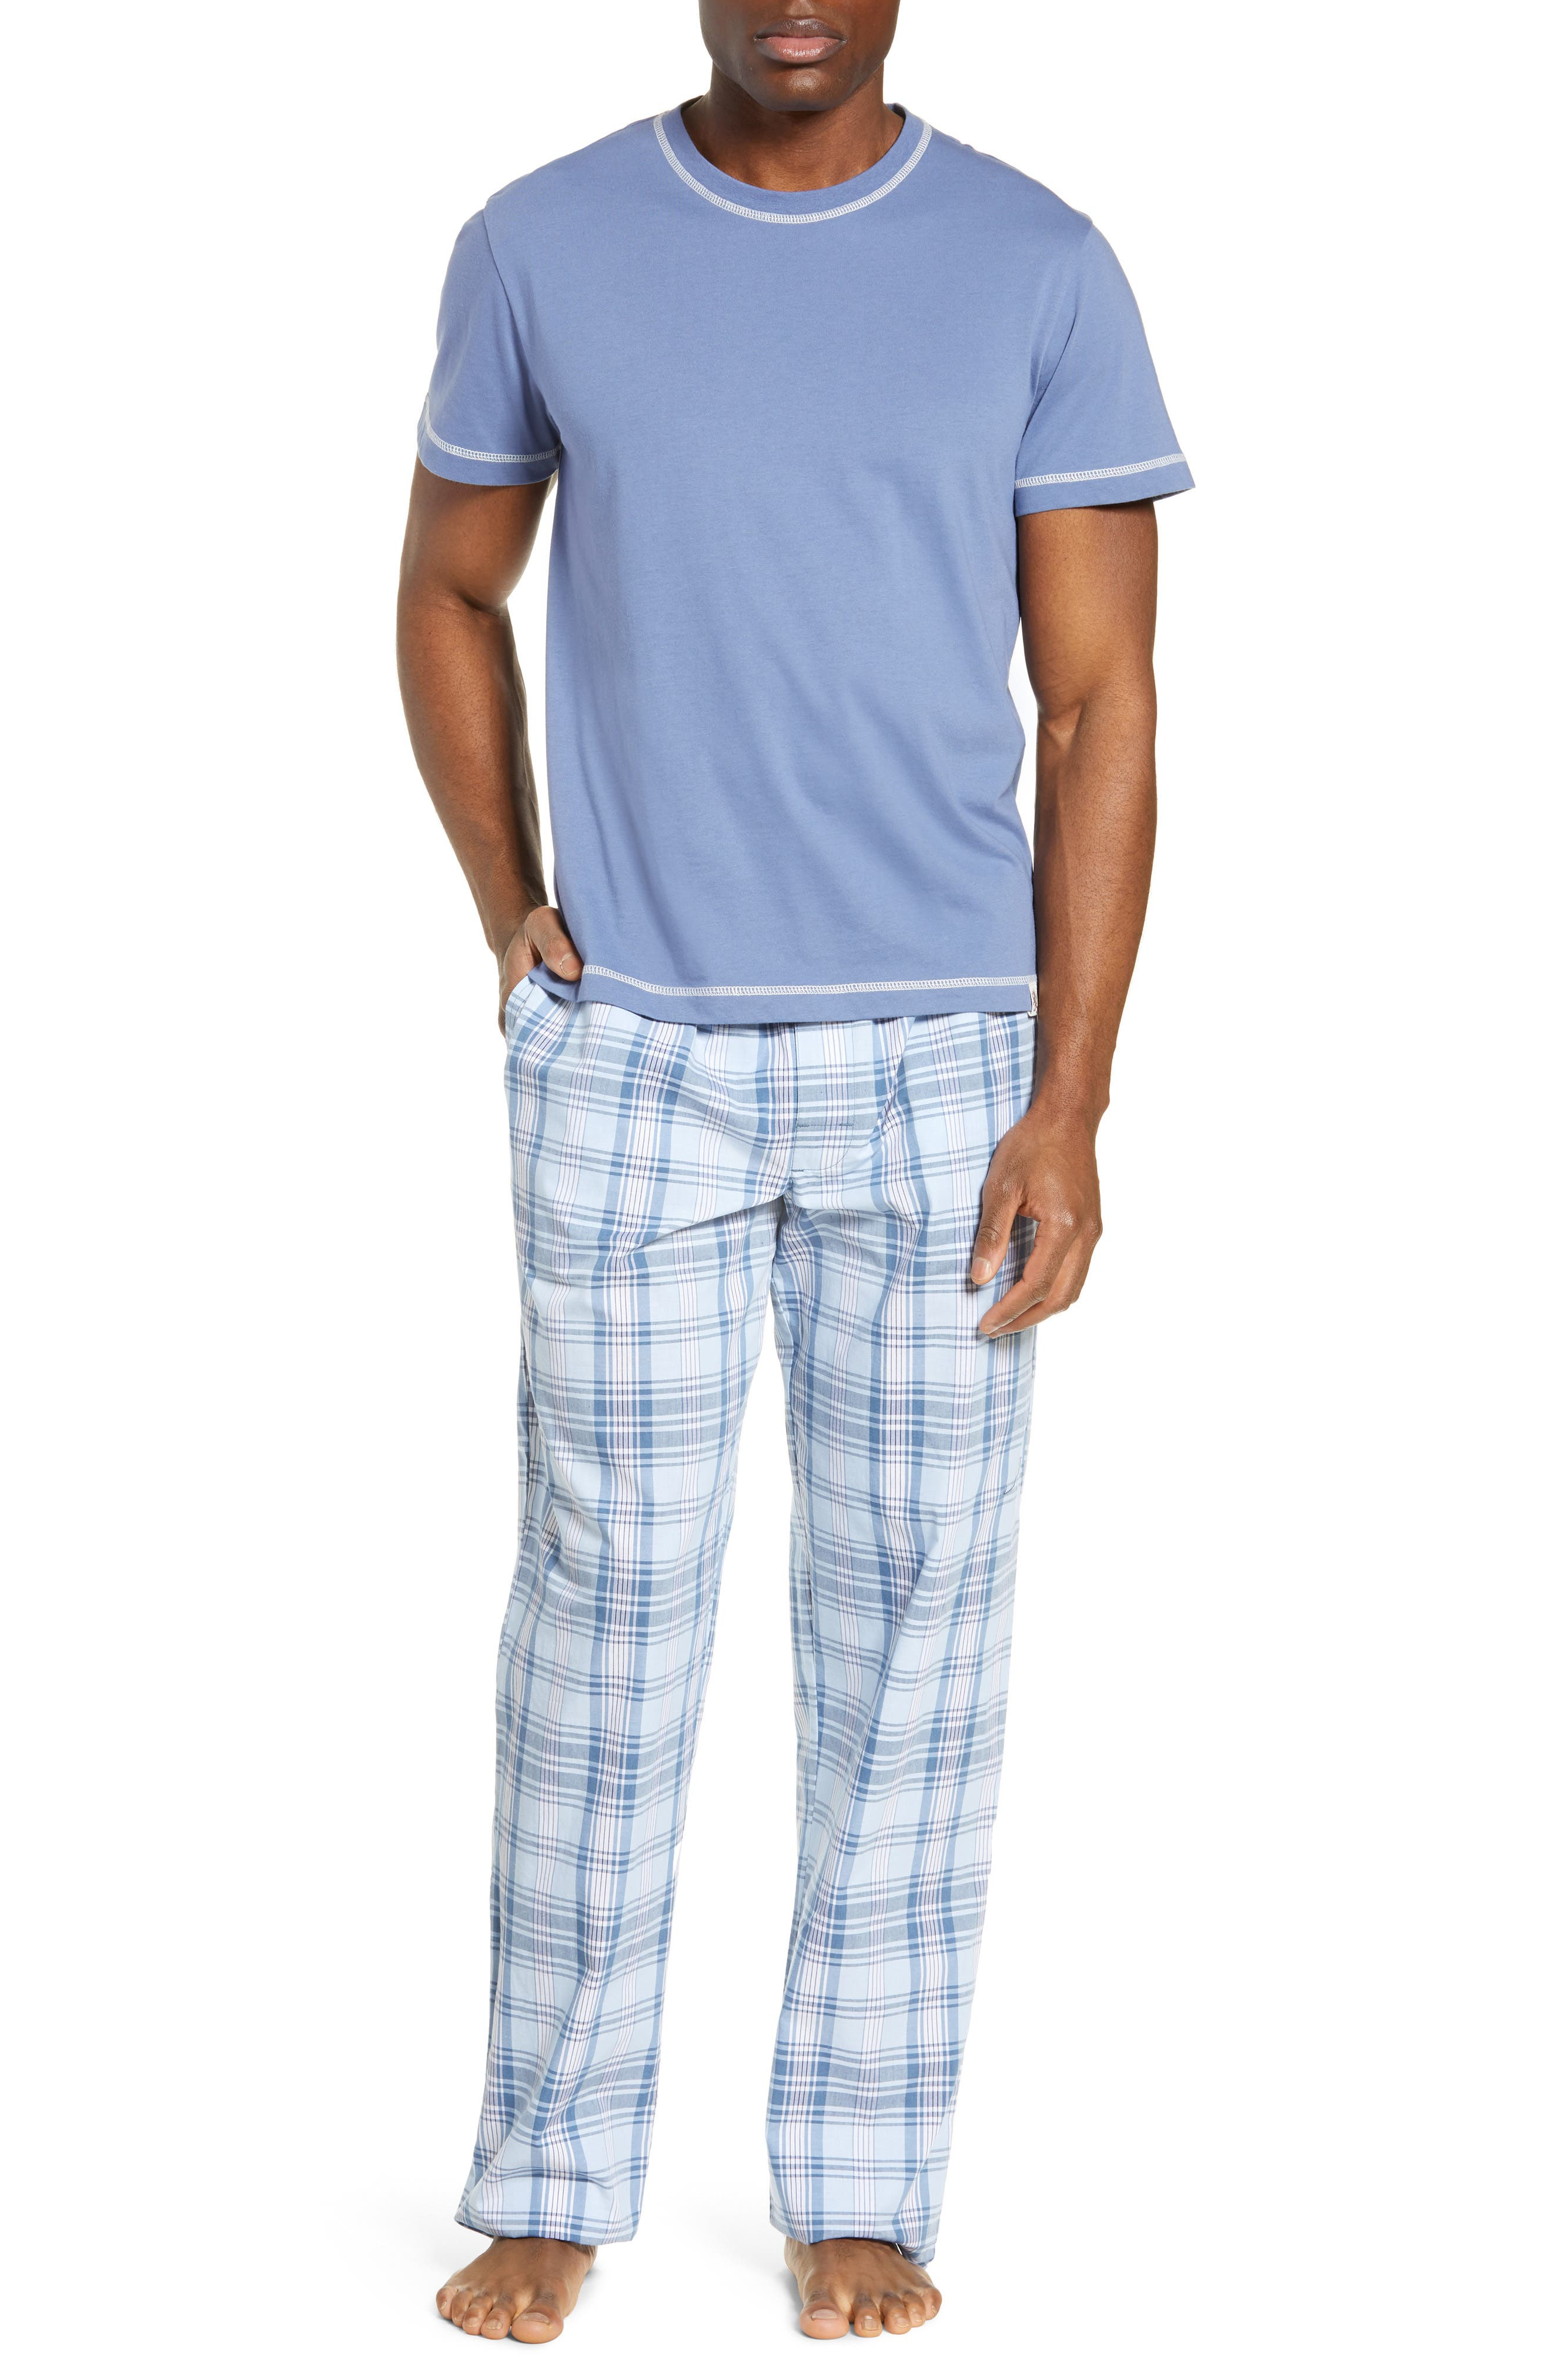 Majestic International Check Mates Pajamas, Blue